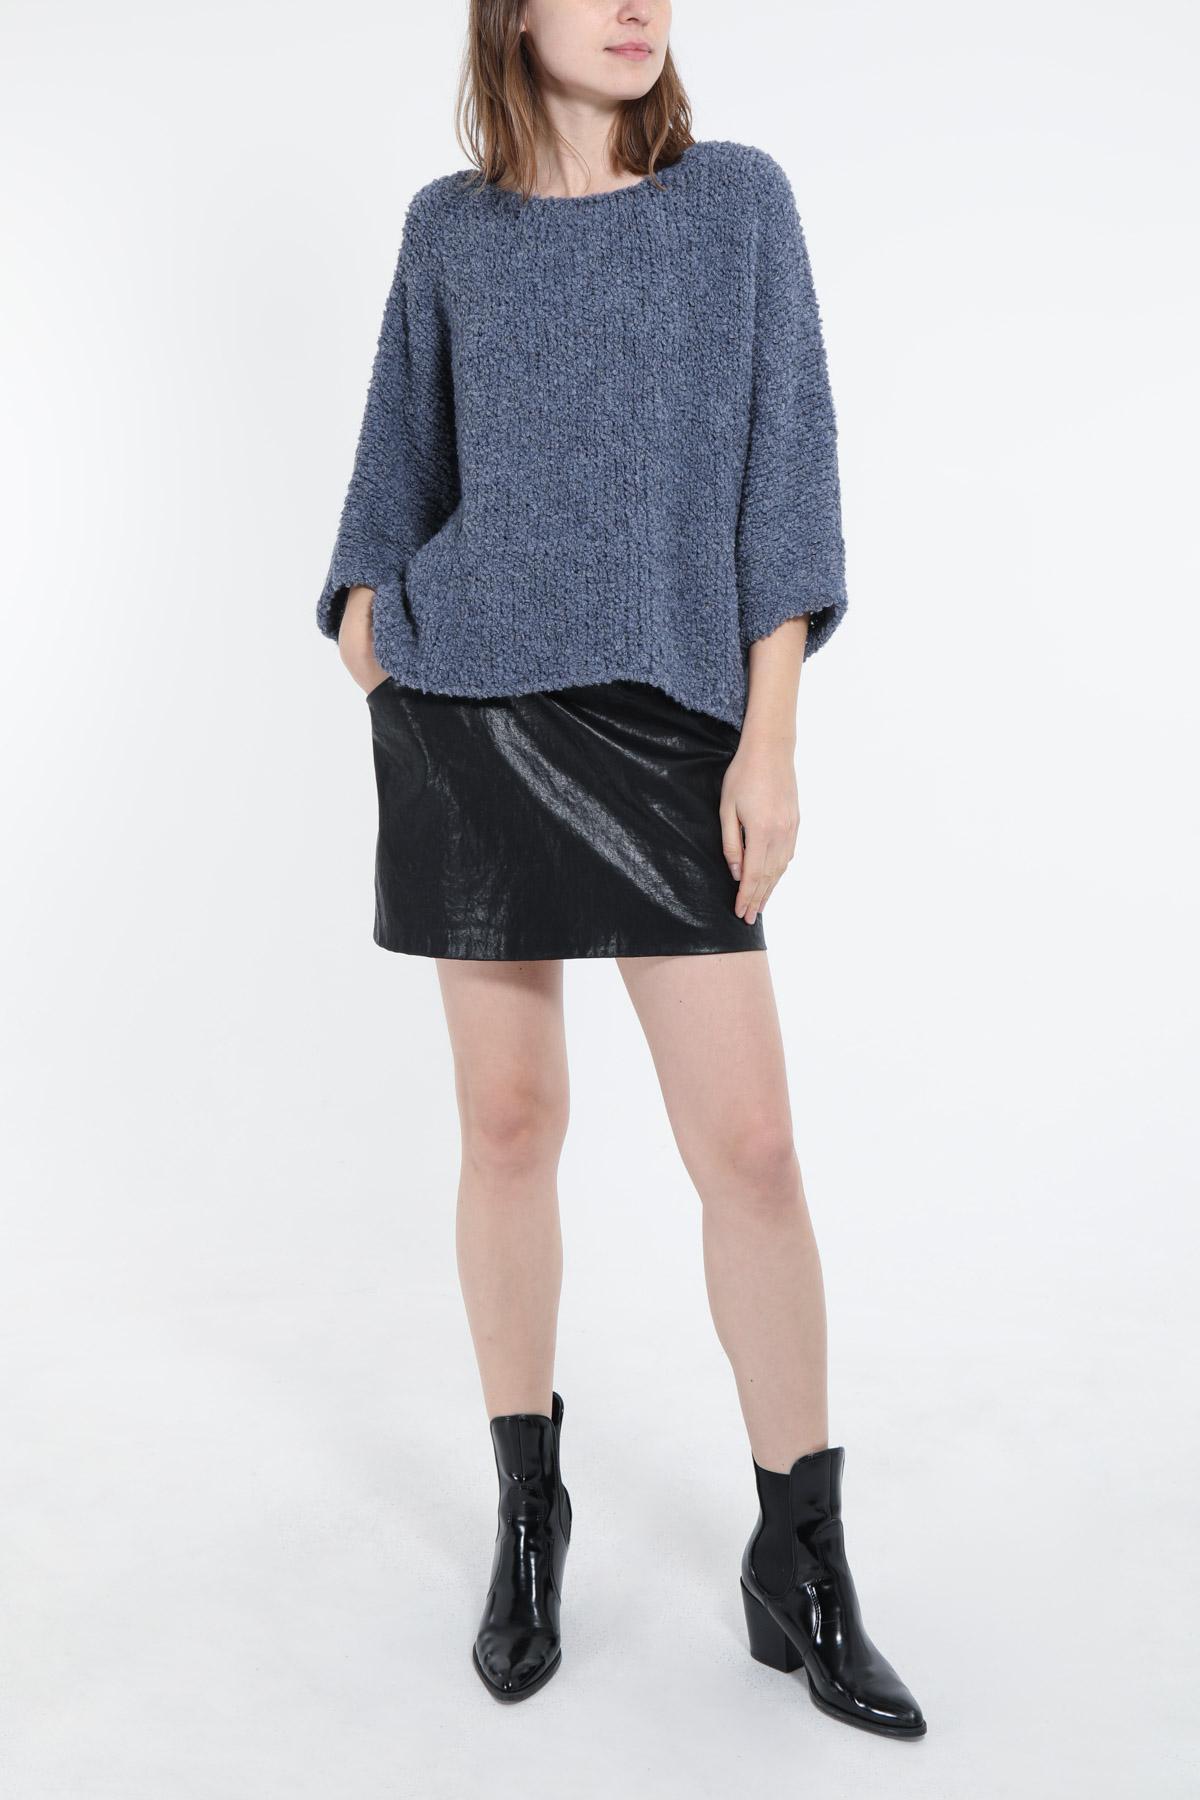 Pulls Femme Bleu jean PINKA 19607 #c eFashion Paris